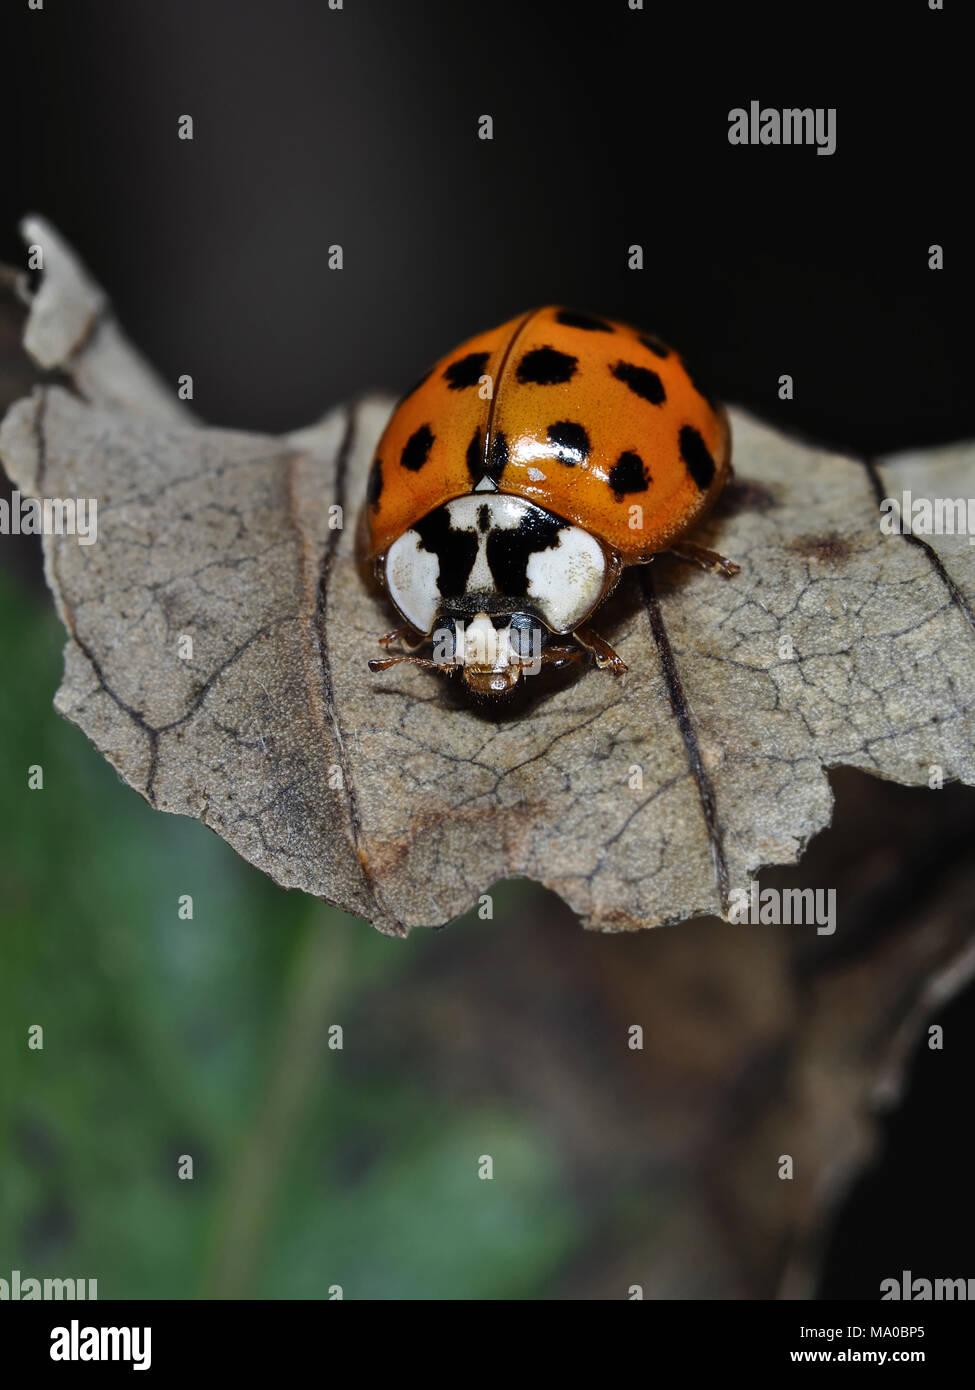 Asia (Harmonia axyridis ladybeetle) en una hoja, Vista cercana Foto de stock